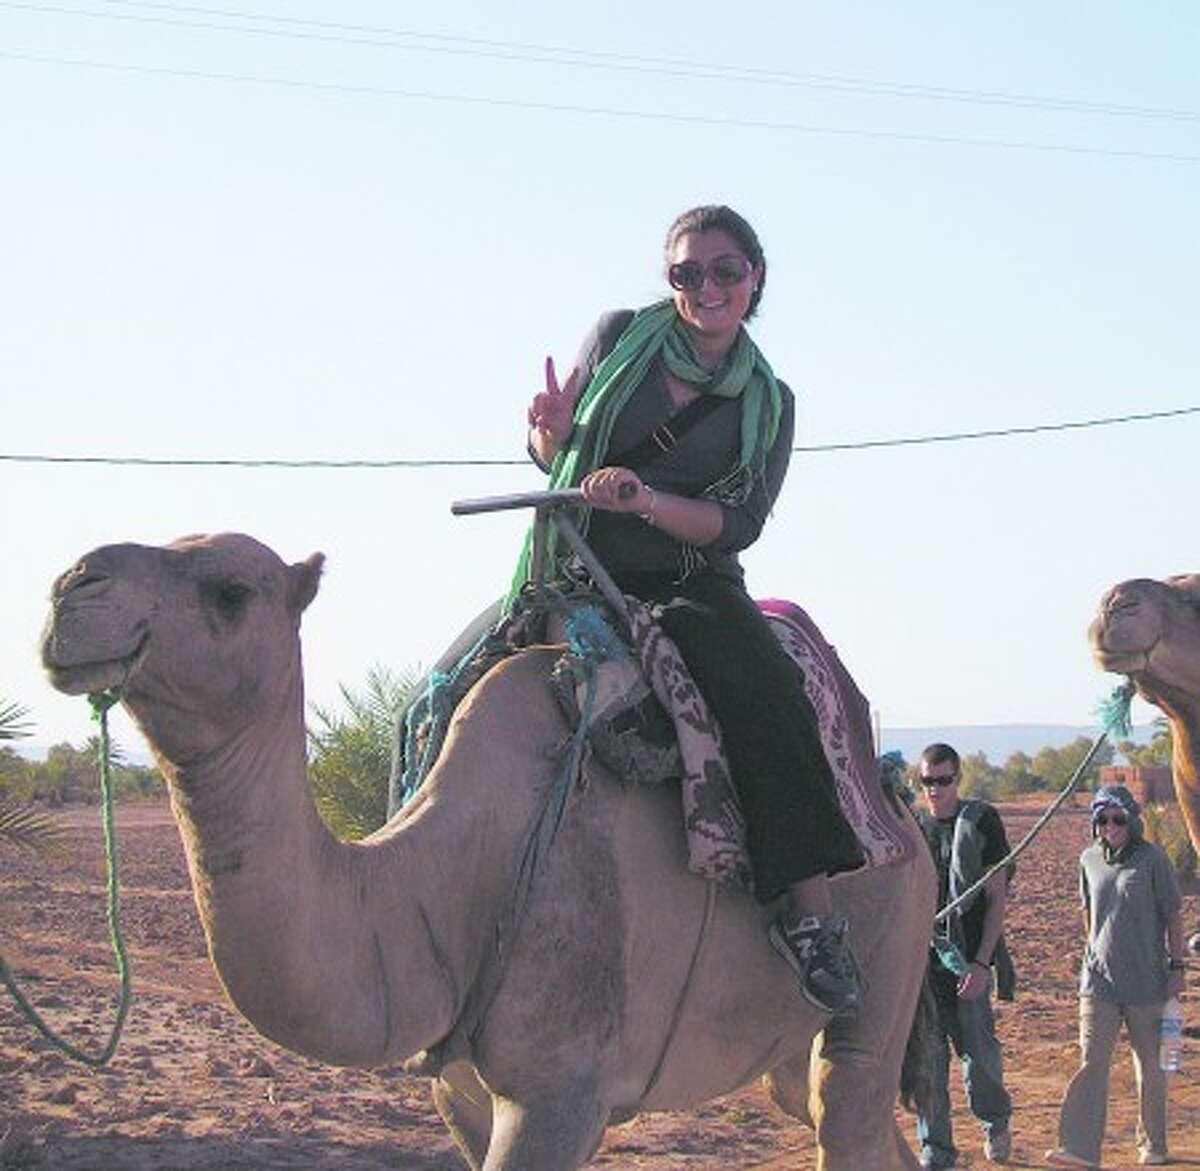 Sonya Jeffereis, a 2006 Wilton High School graduate, traverses the Sahara Desert in Morraco on camel back. Contributed photo